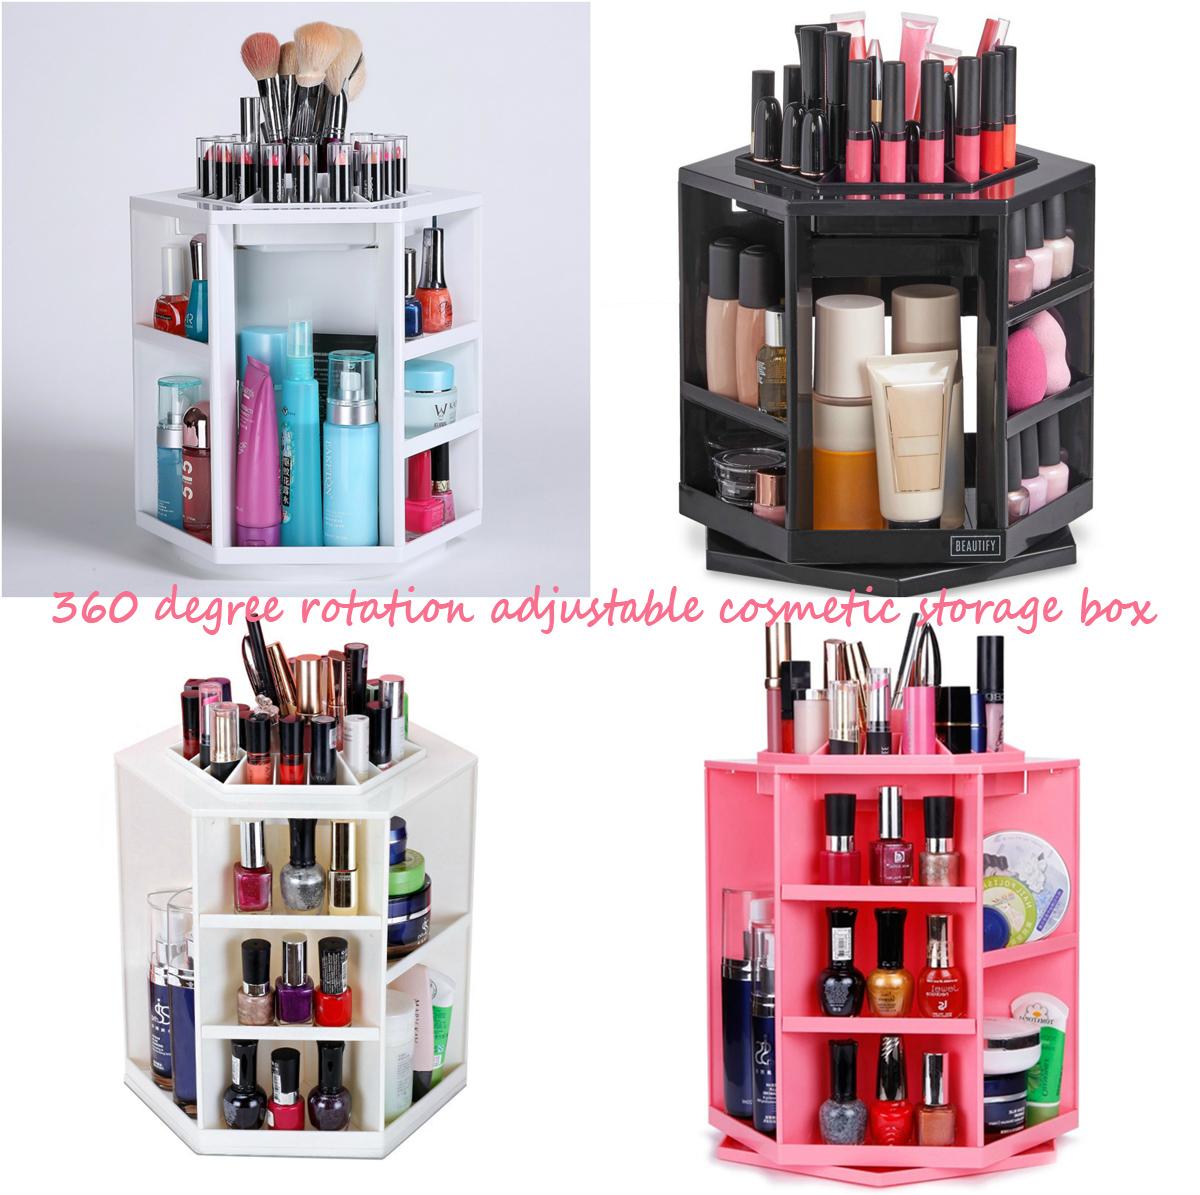 360-degree-rotation-adjustable-cosmetic-storage-box